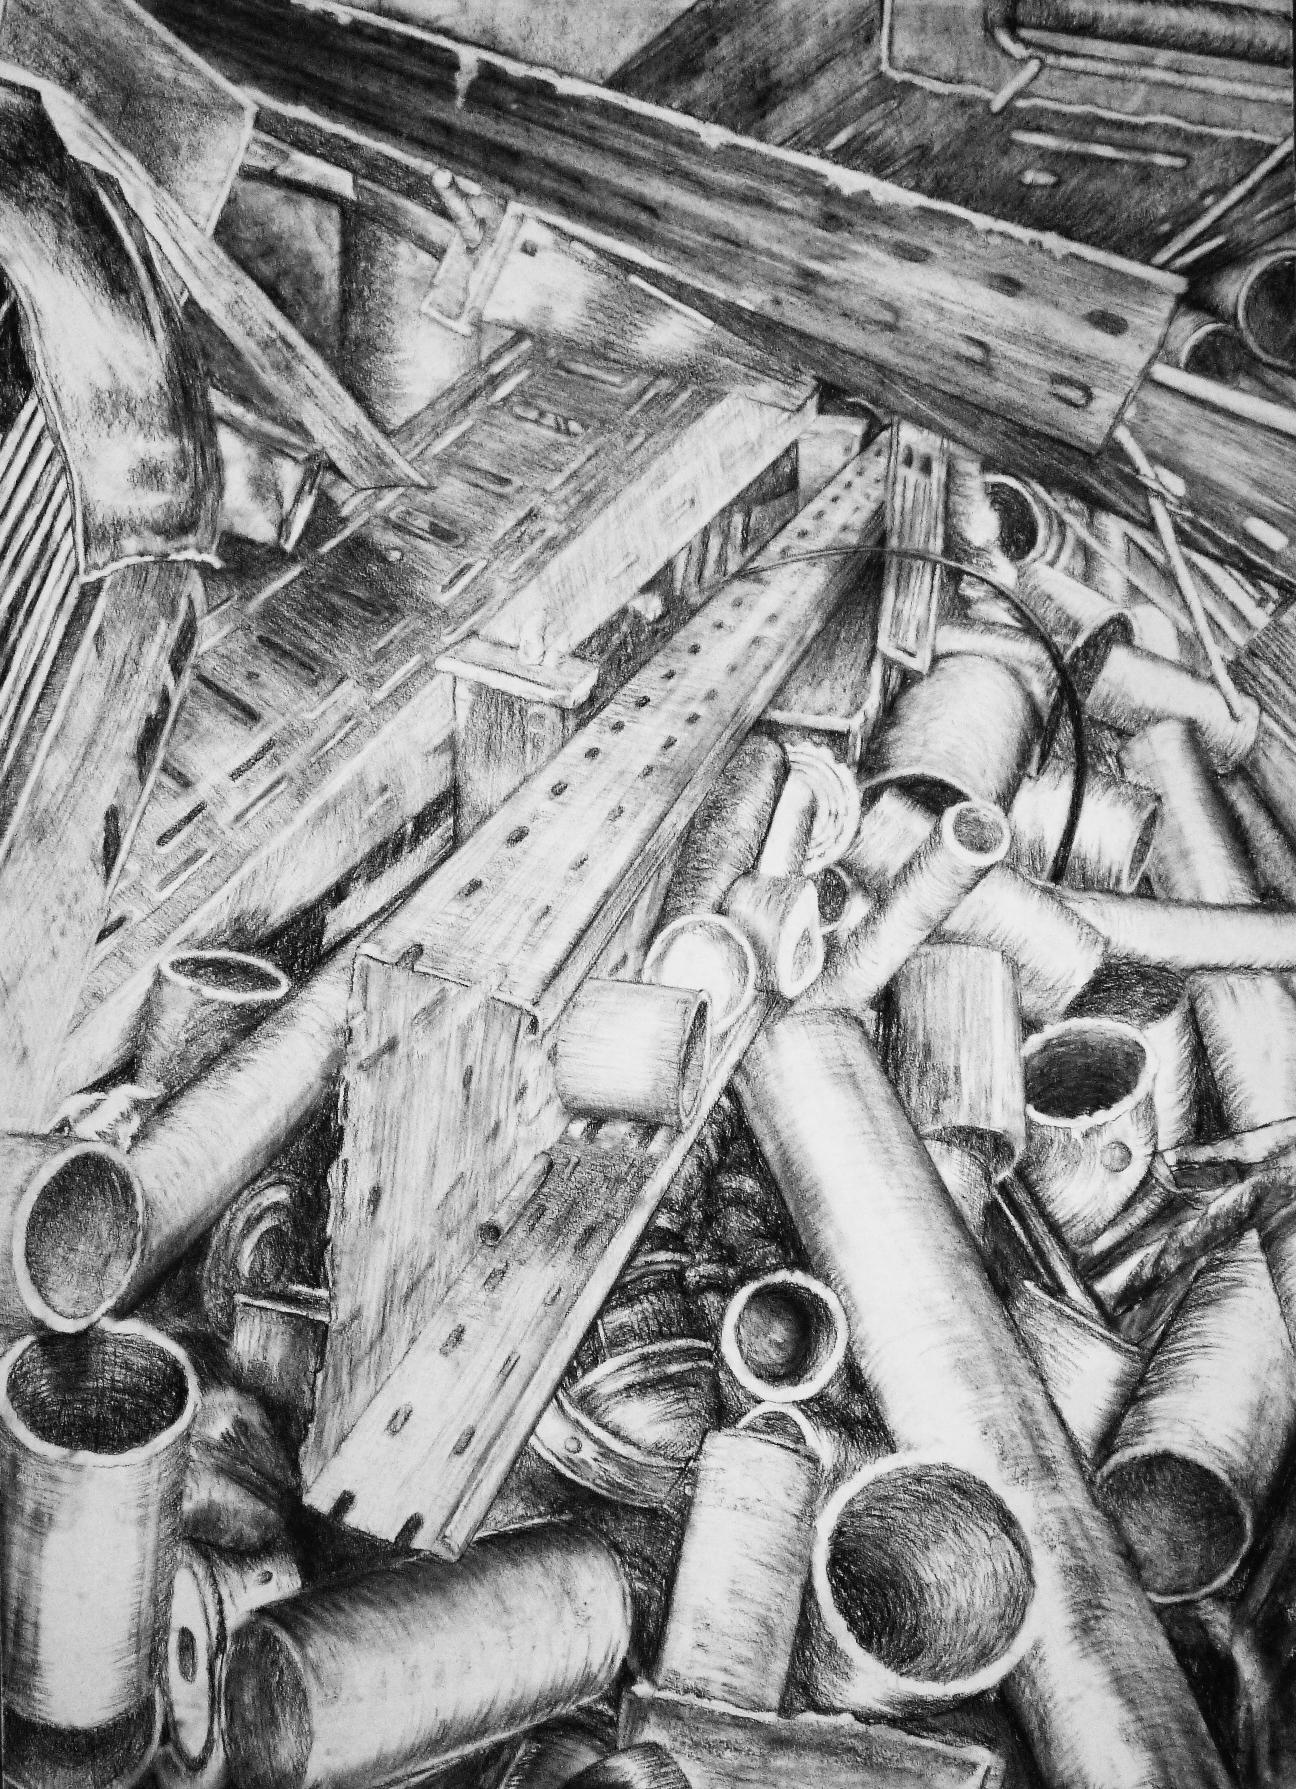 'Müll III', Kreide, Kohle auf Aquarellpapier, 70cm x 100cm